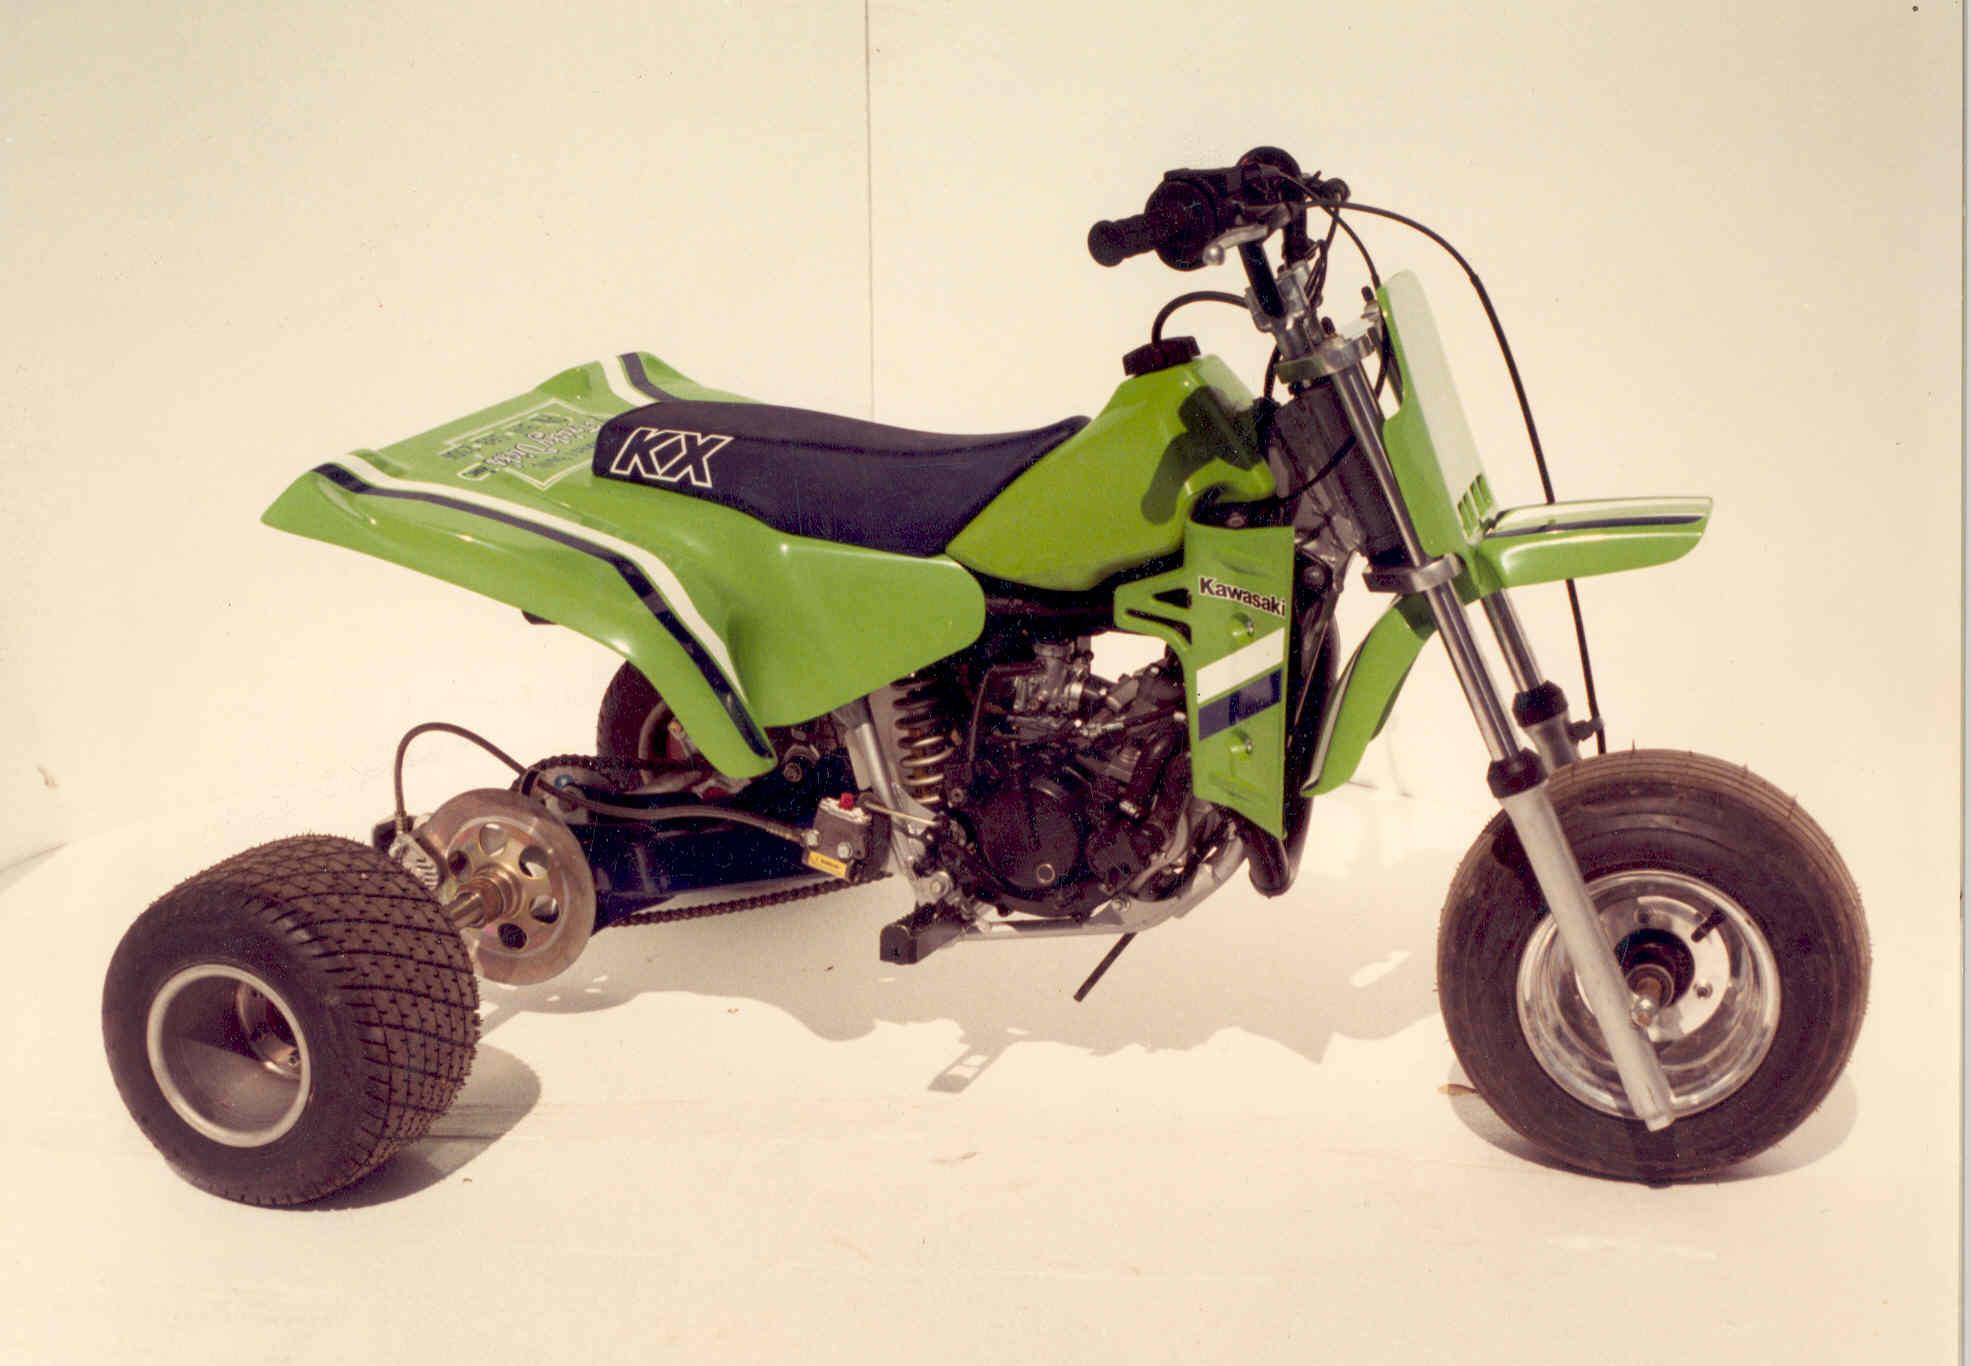 KX65 also Kx 250 besides Intruder 125ed additionally 2016 Kawasaki Dirt Bikes likewise 2004 Kx250f 40503. on 2010 kawasaki kx65